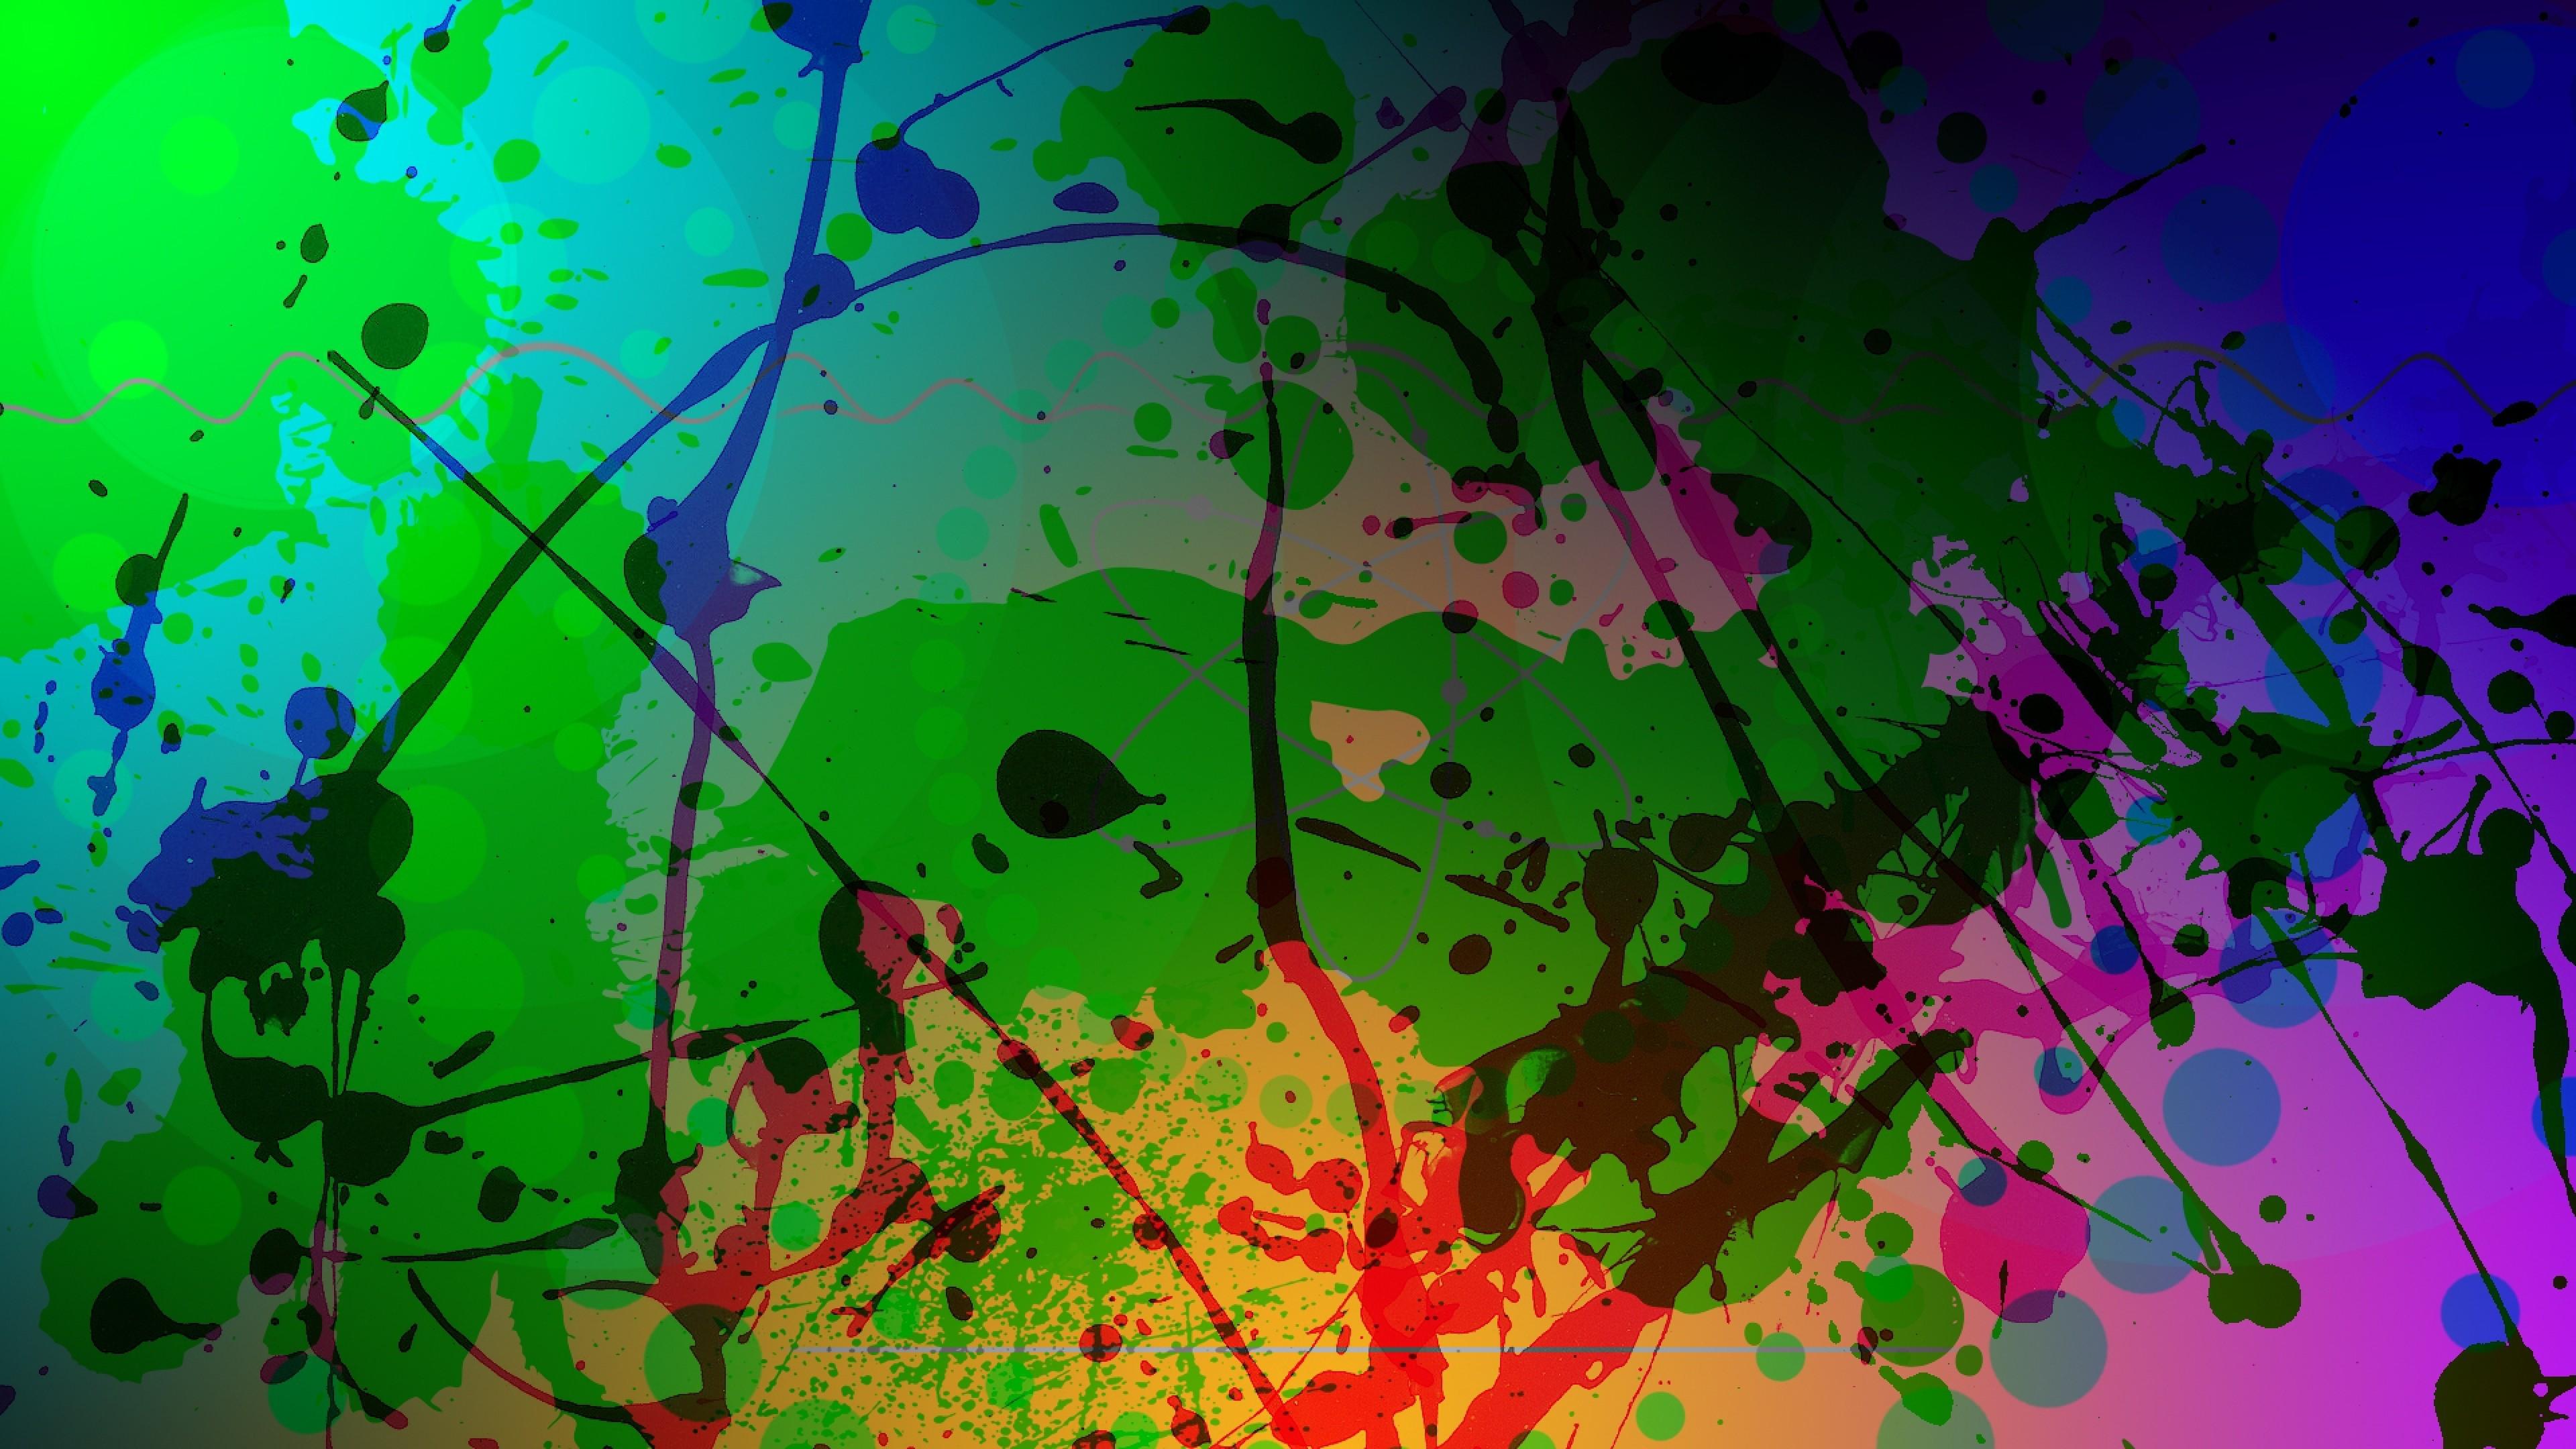 кляксы краски цвета арт онлайн